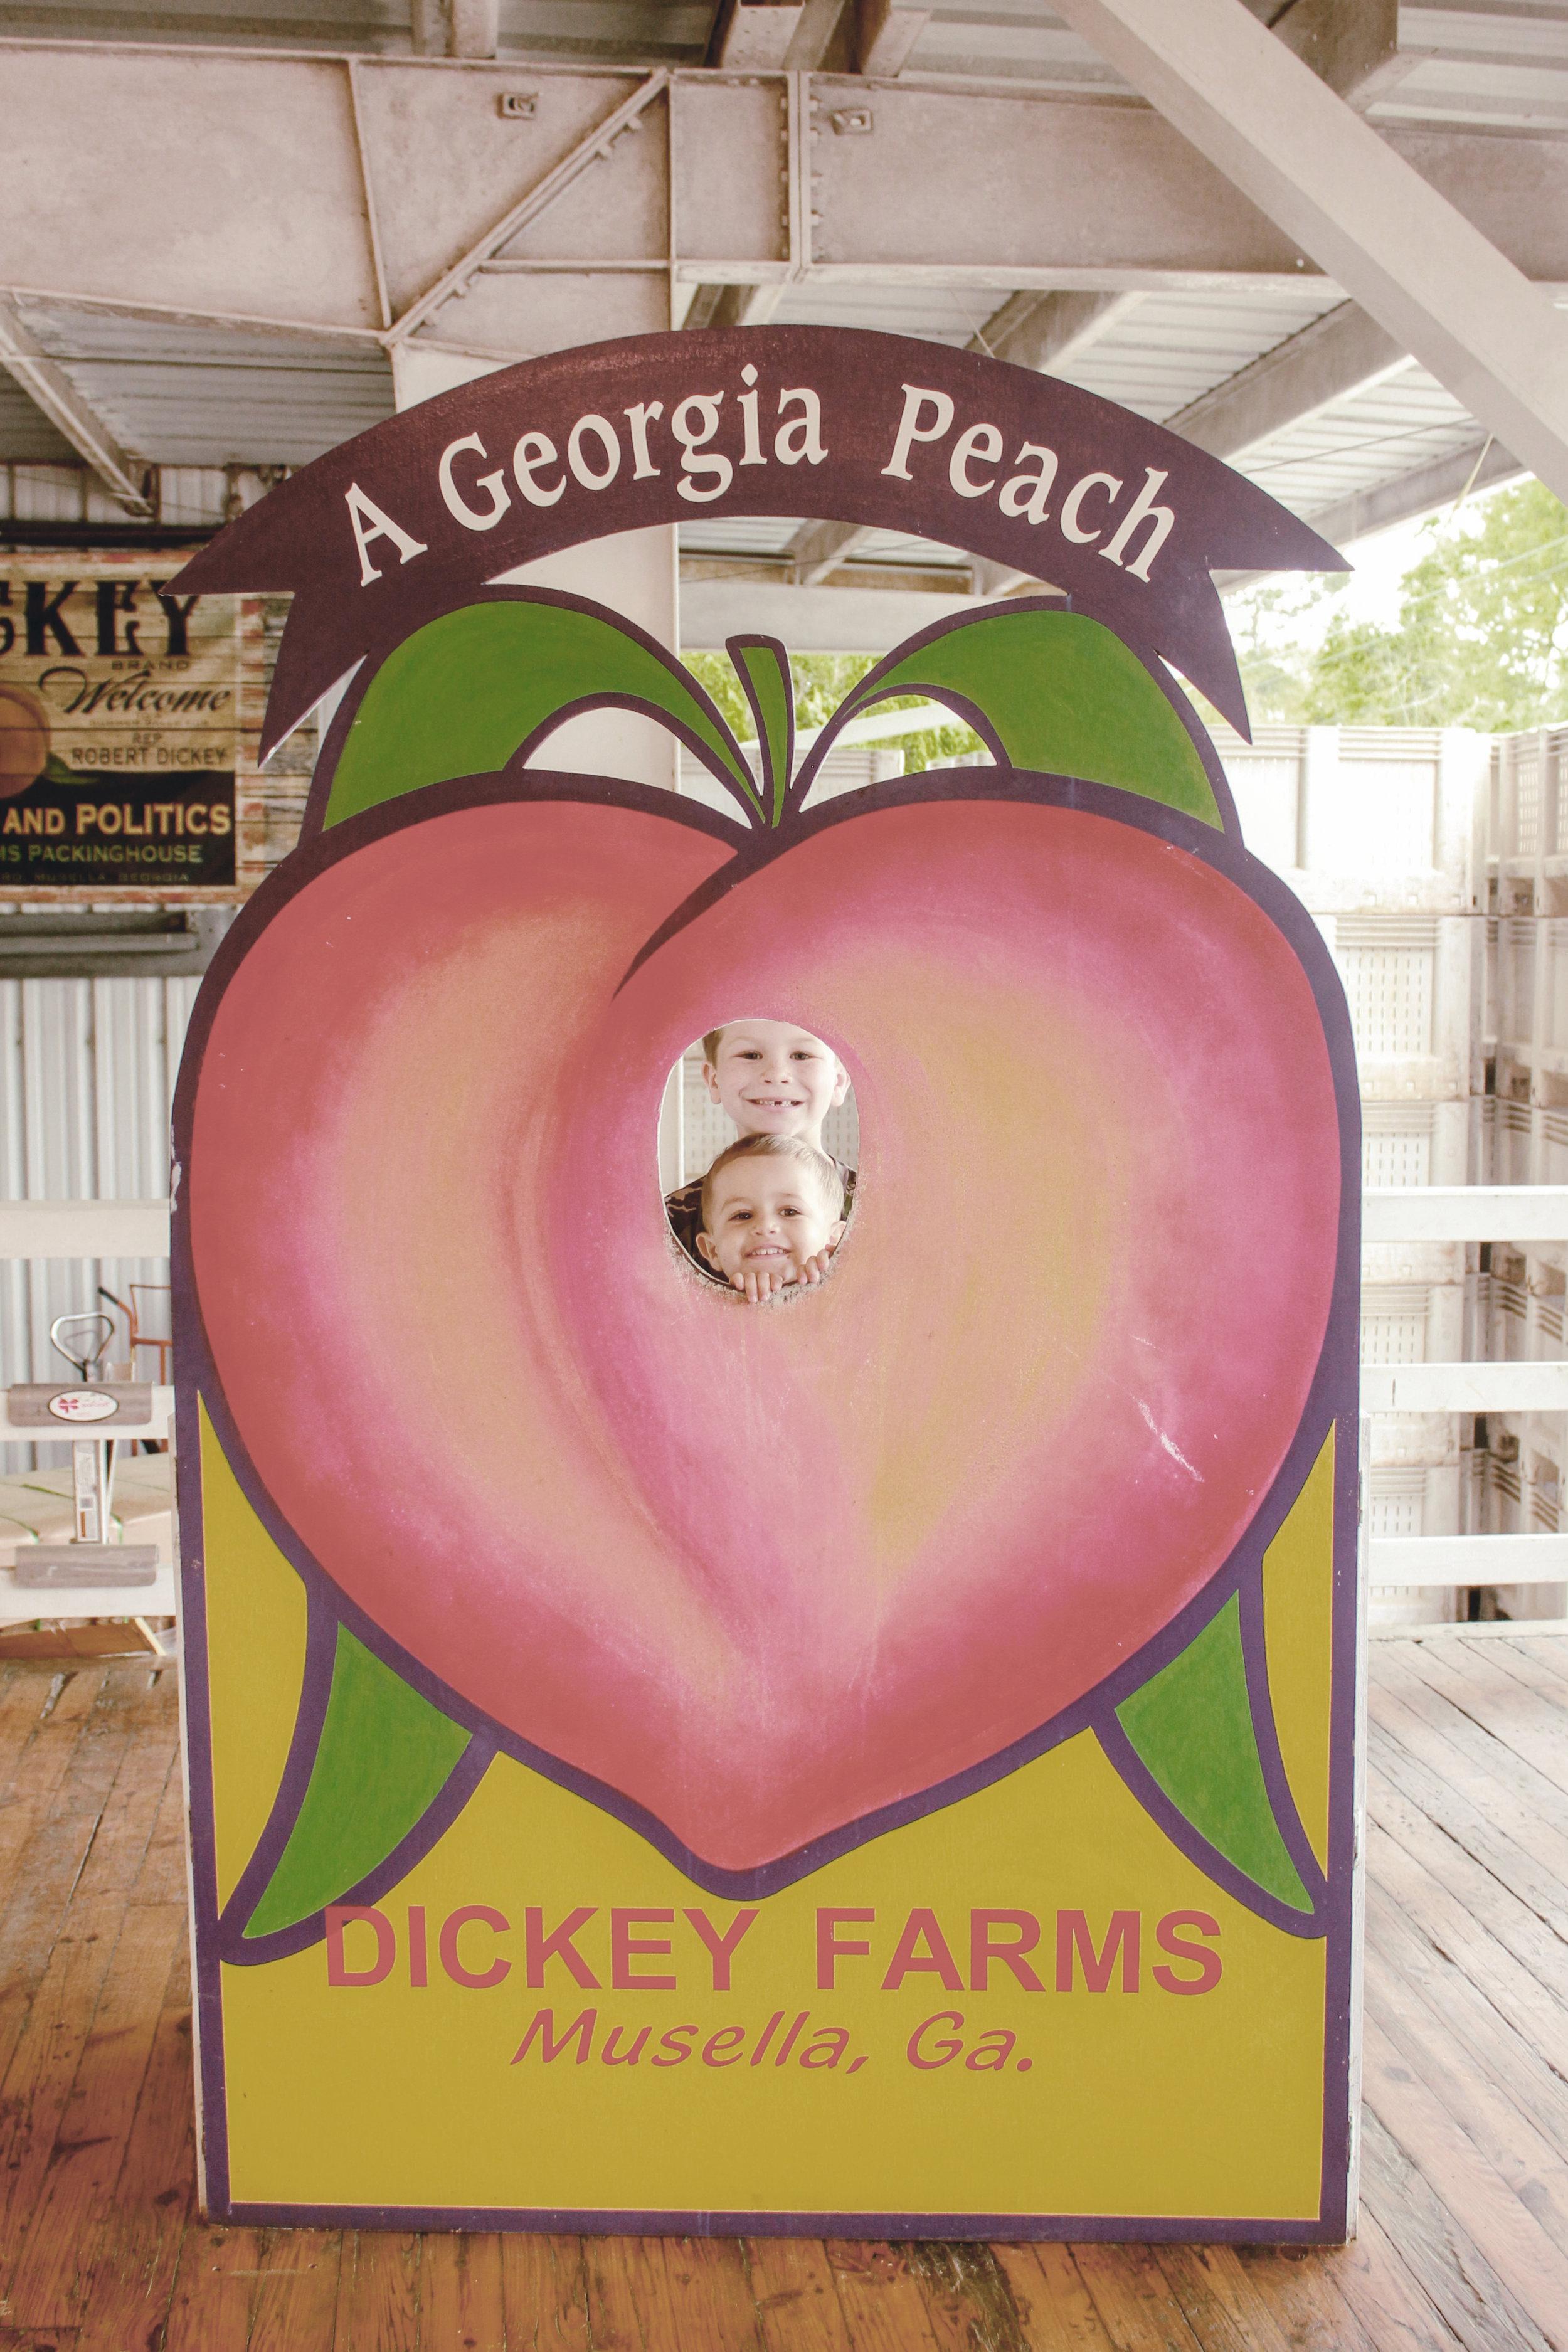 dickey farms peach grower / musella ga / heirloomed travel